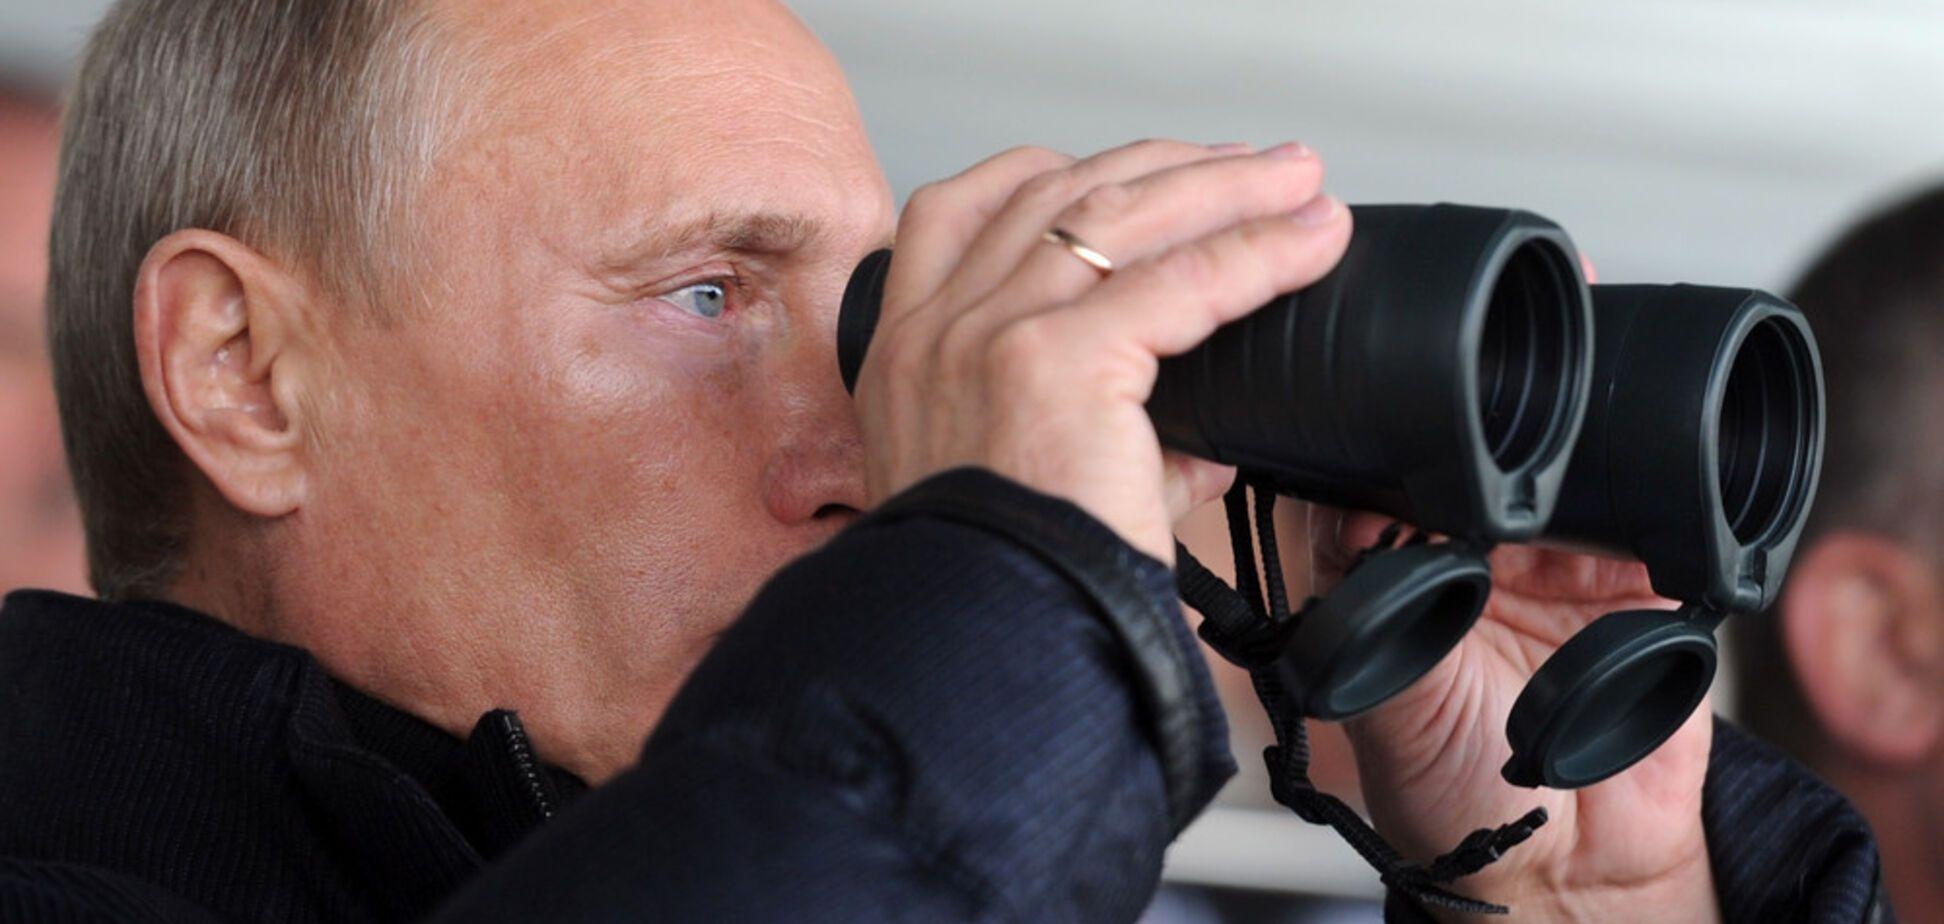 Владимир Путин. Источник: Газета.Ру